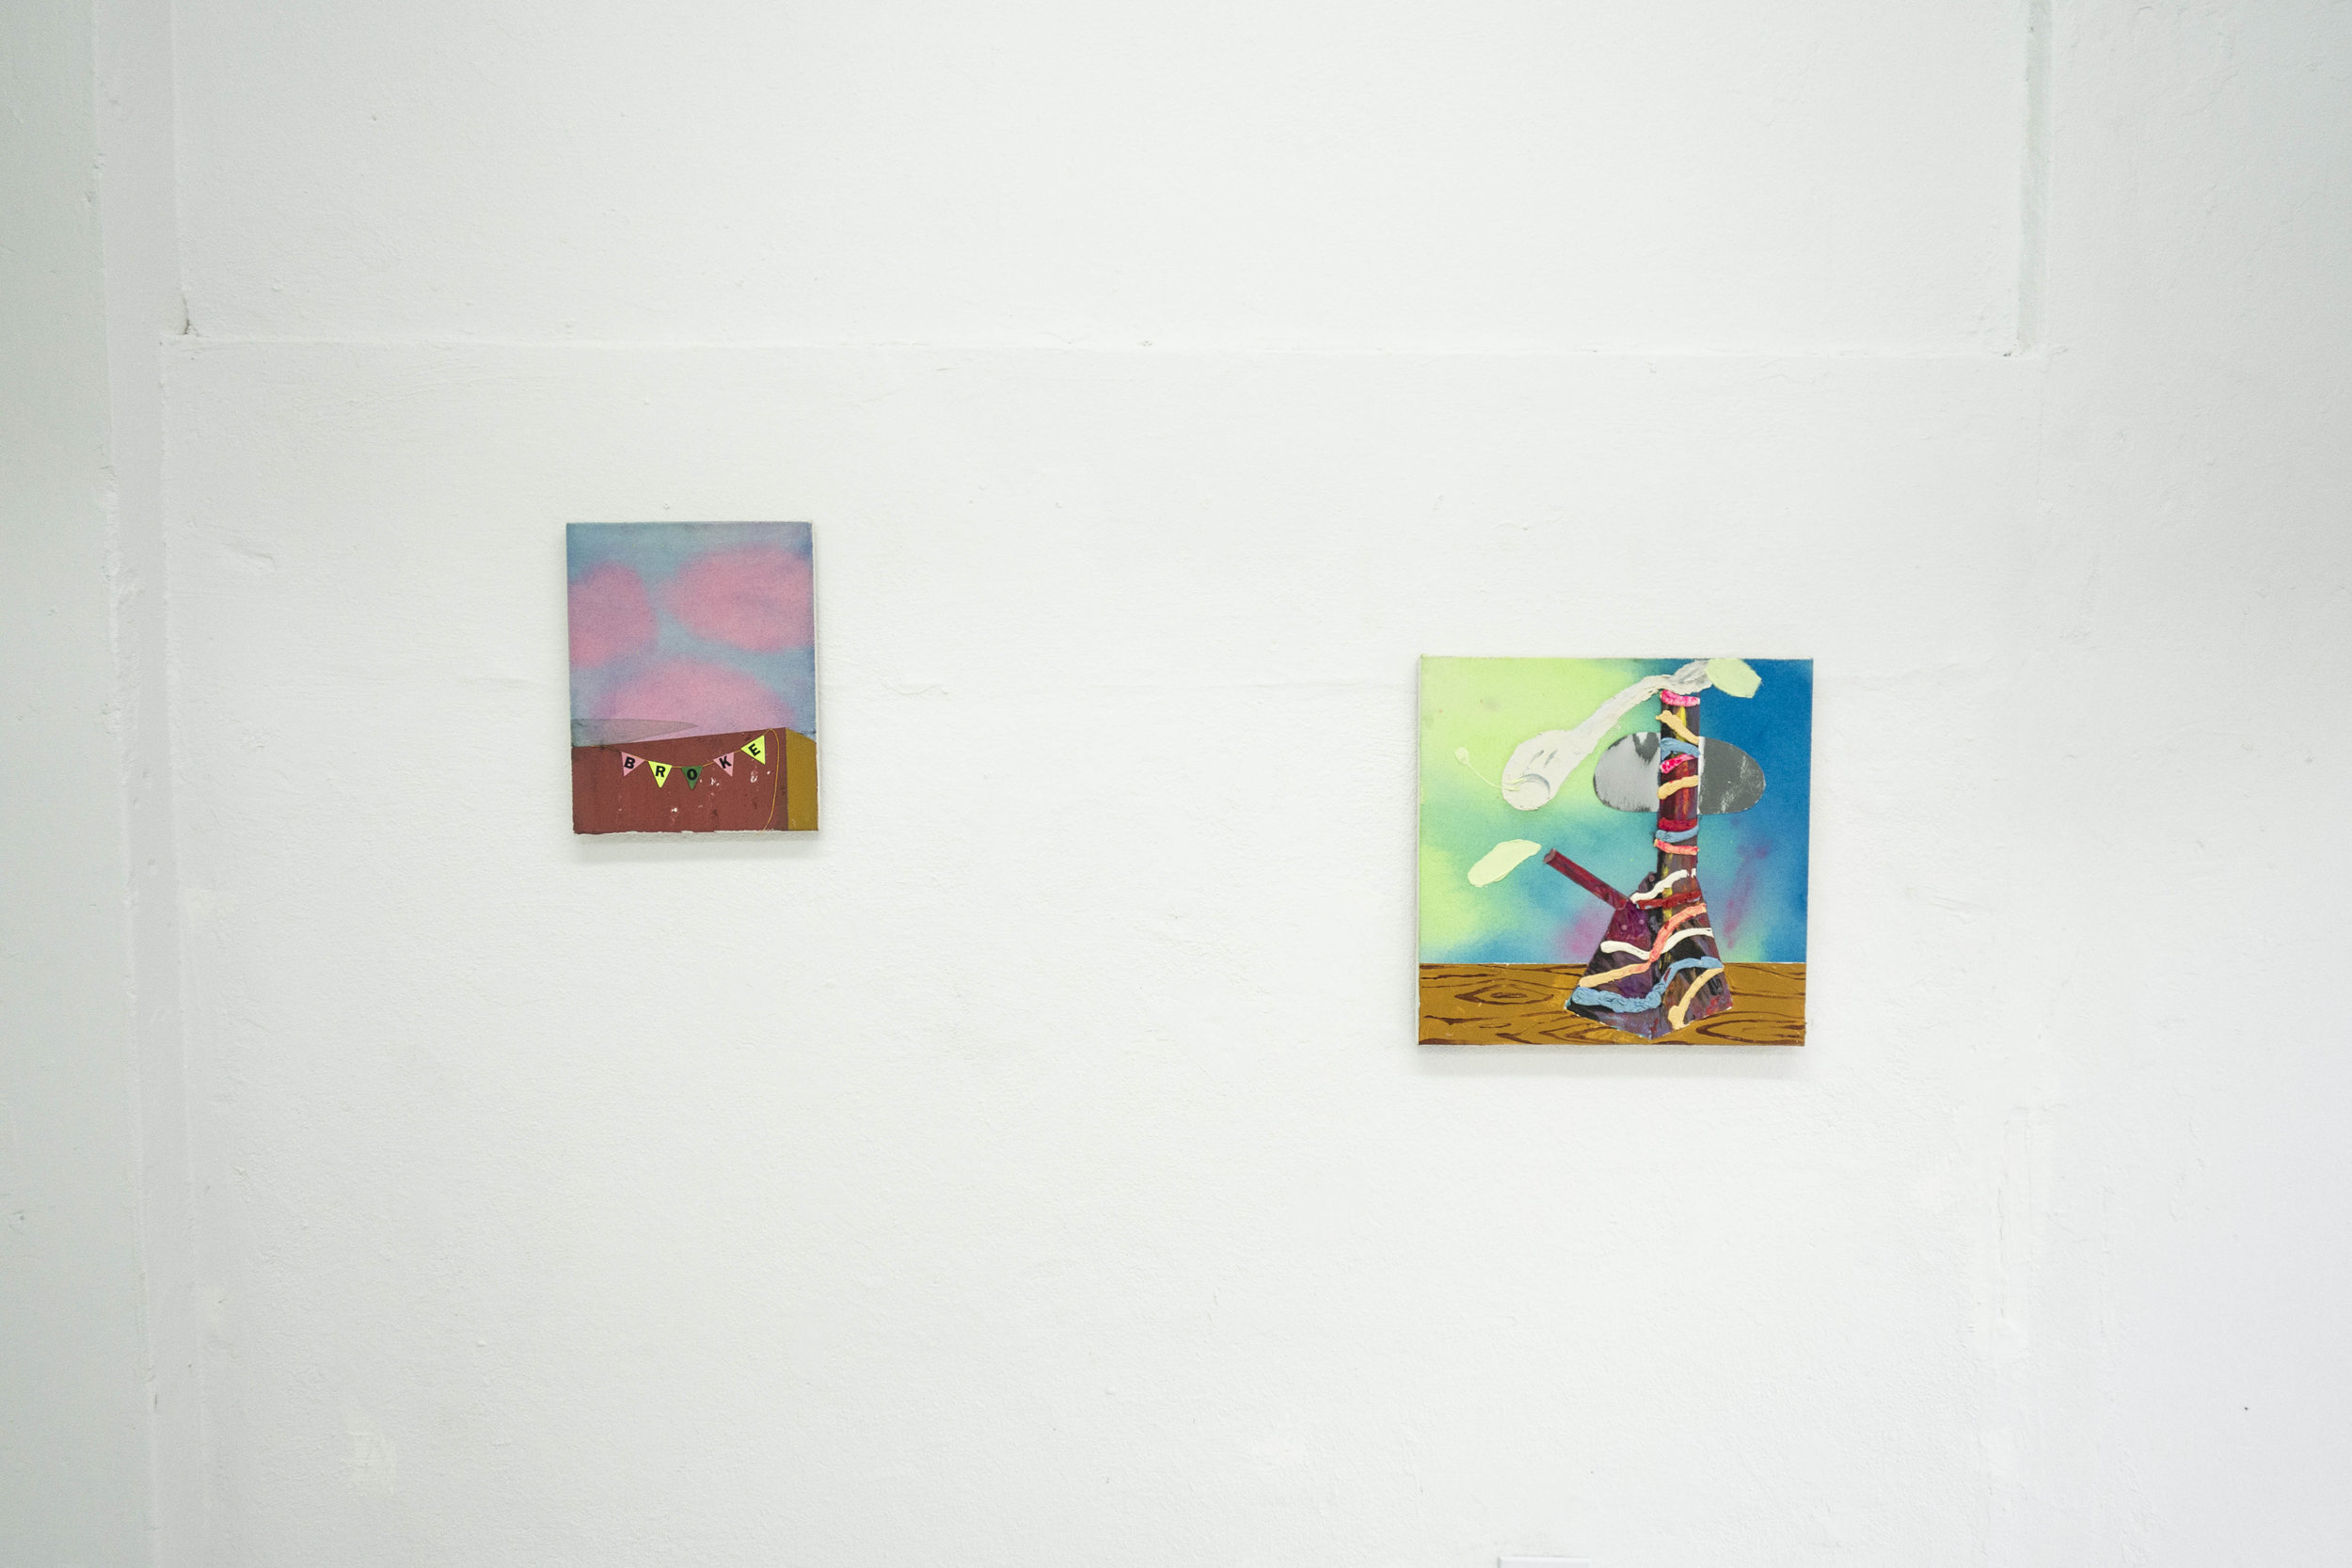 "Omar Velázquez / Untitled (Broke) / Medio Mixto / 11"" x 14""  Omar Velázquez / Untitled (Bonga) / Medio Mixto / 20"" x 20"""